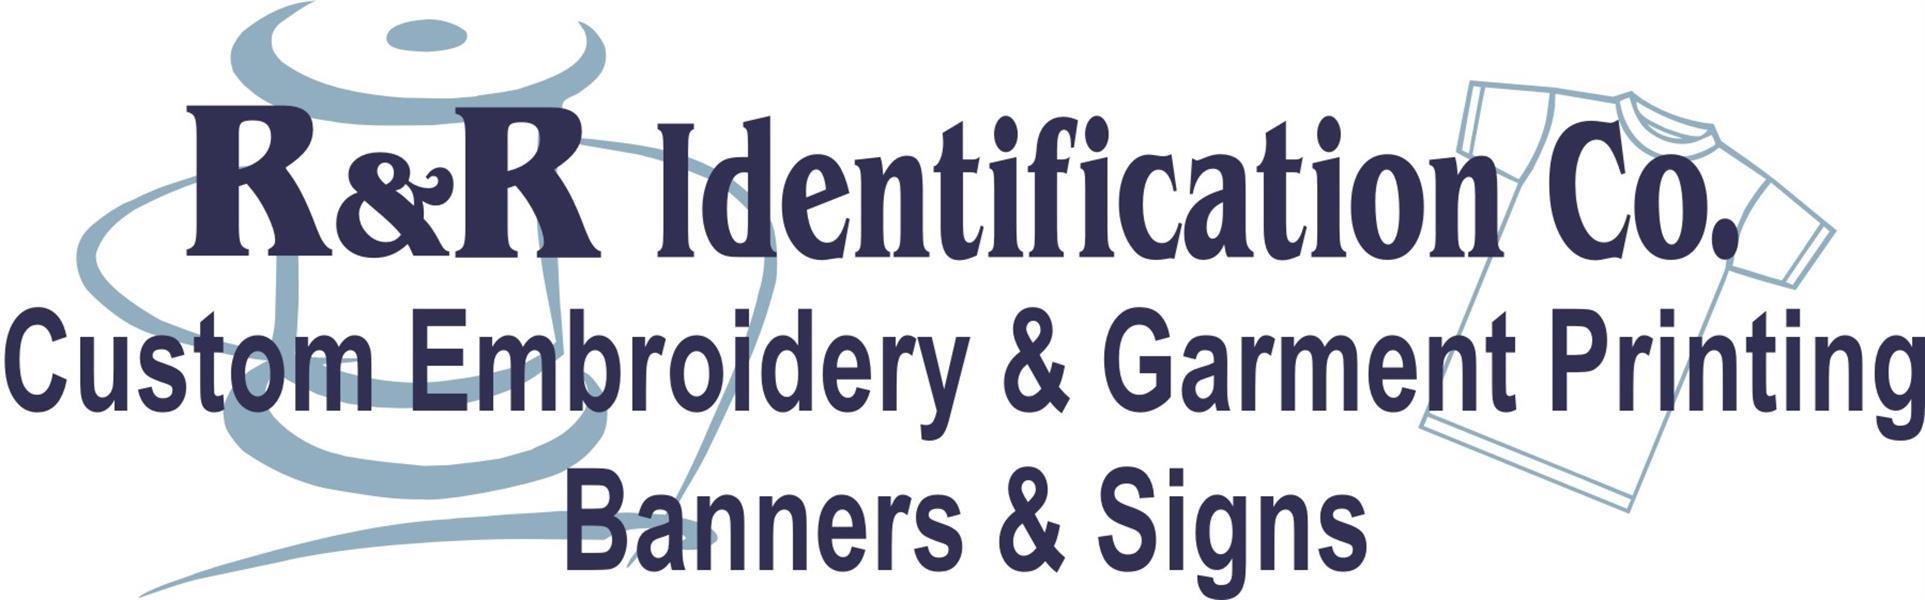 R & R Identification Co.